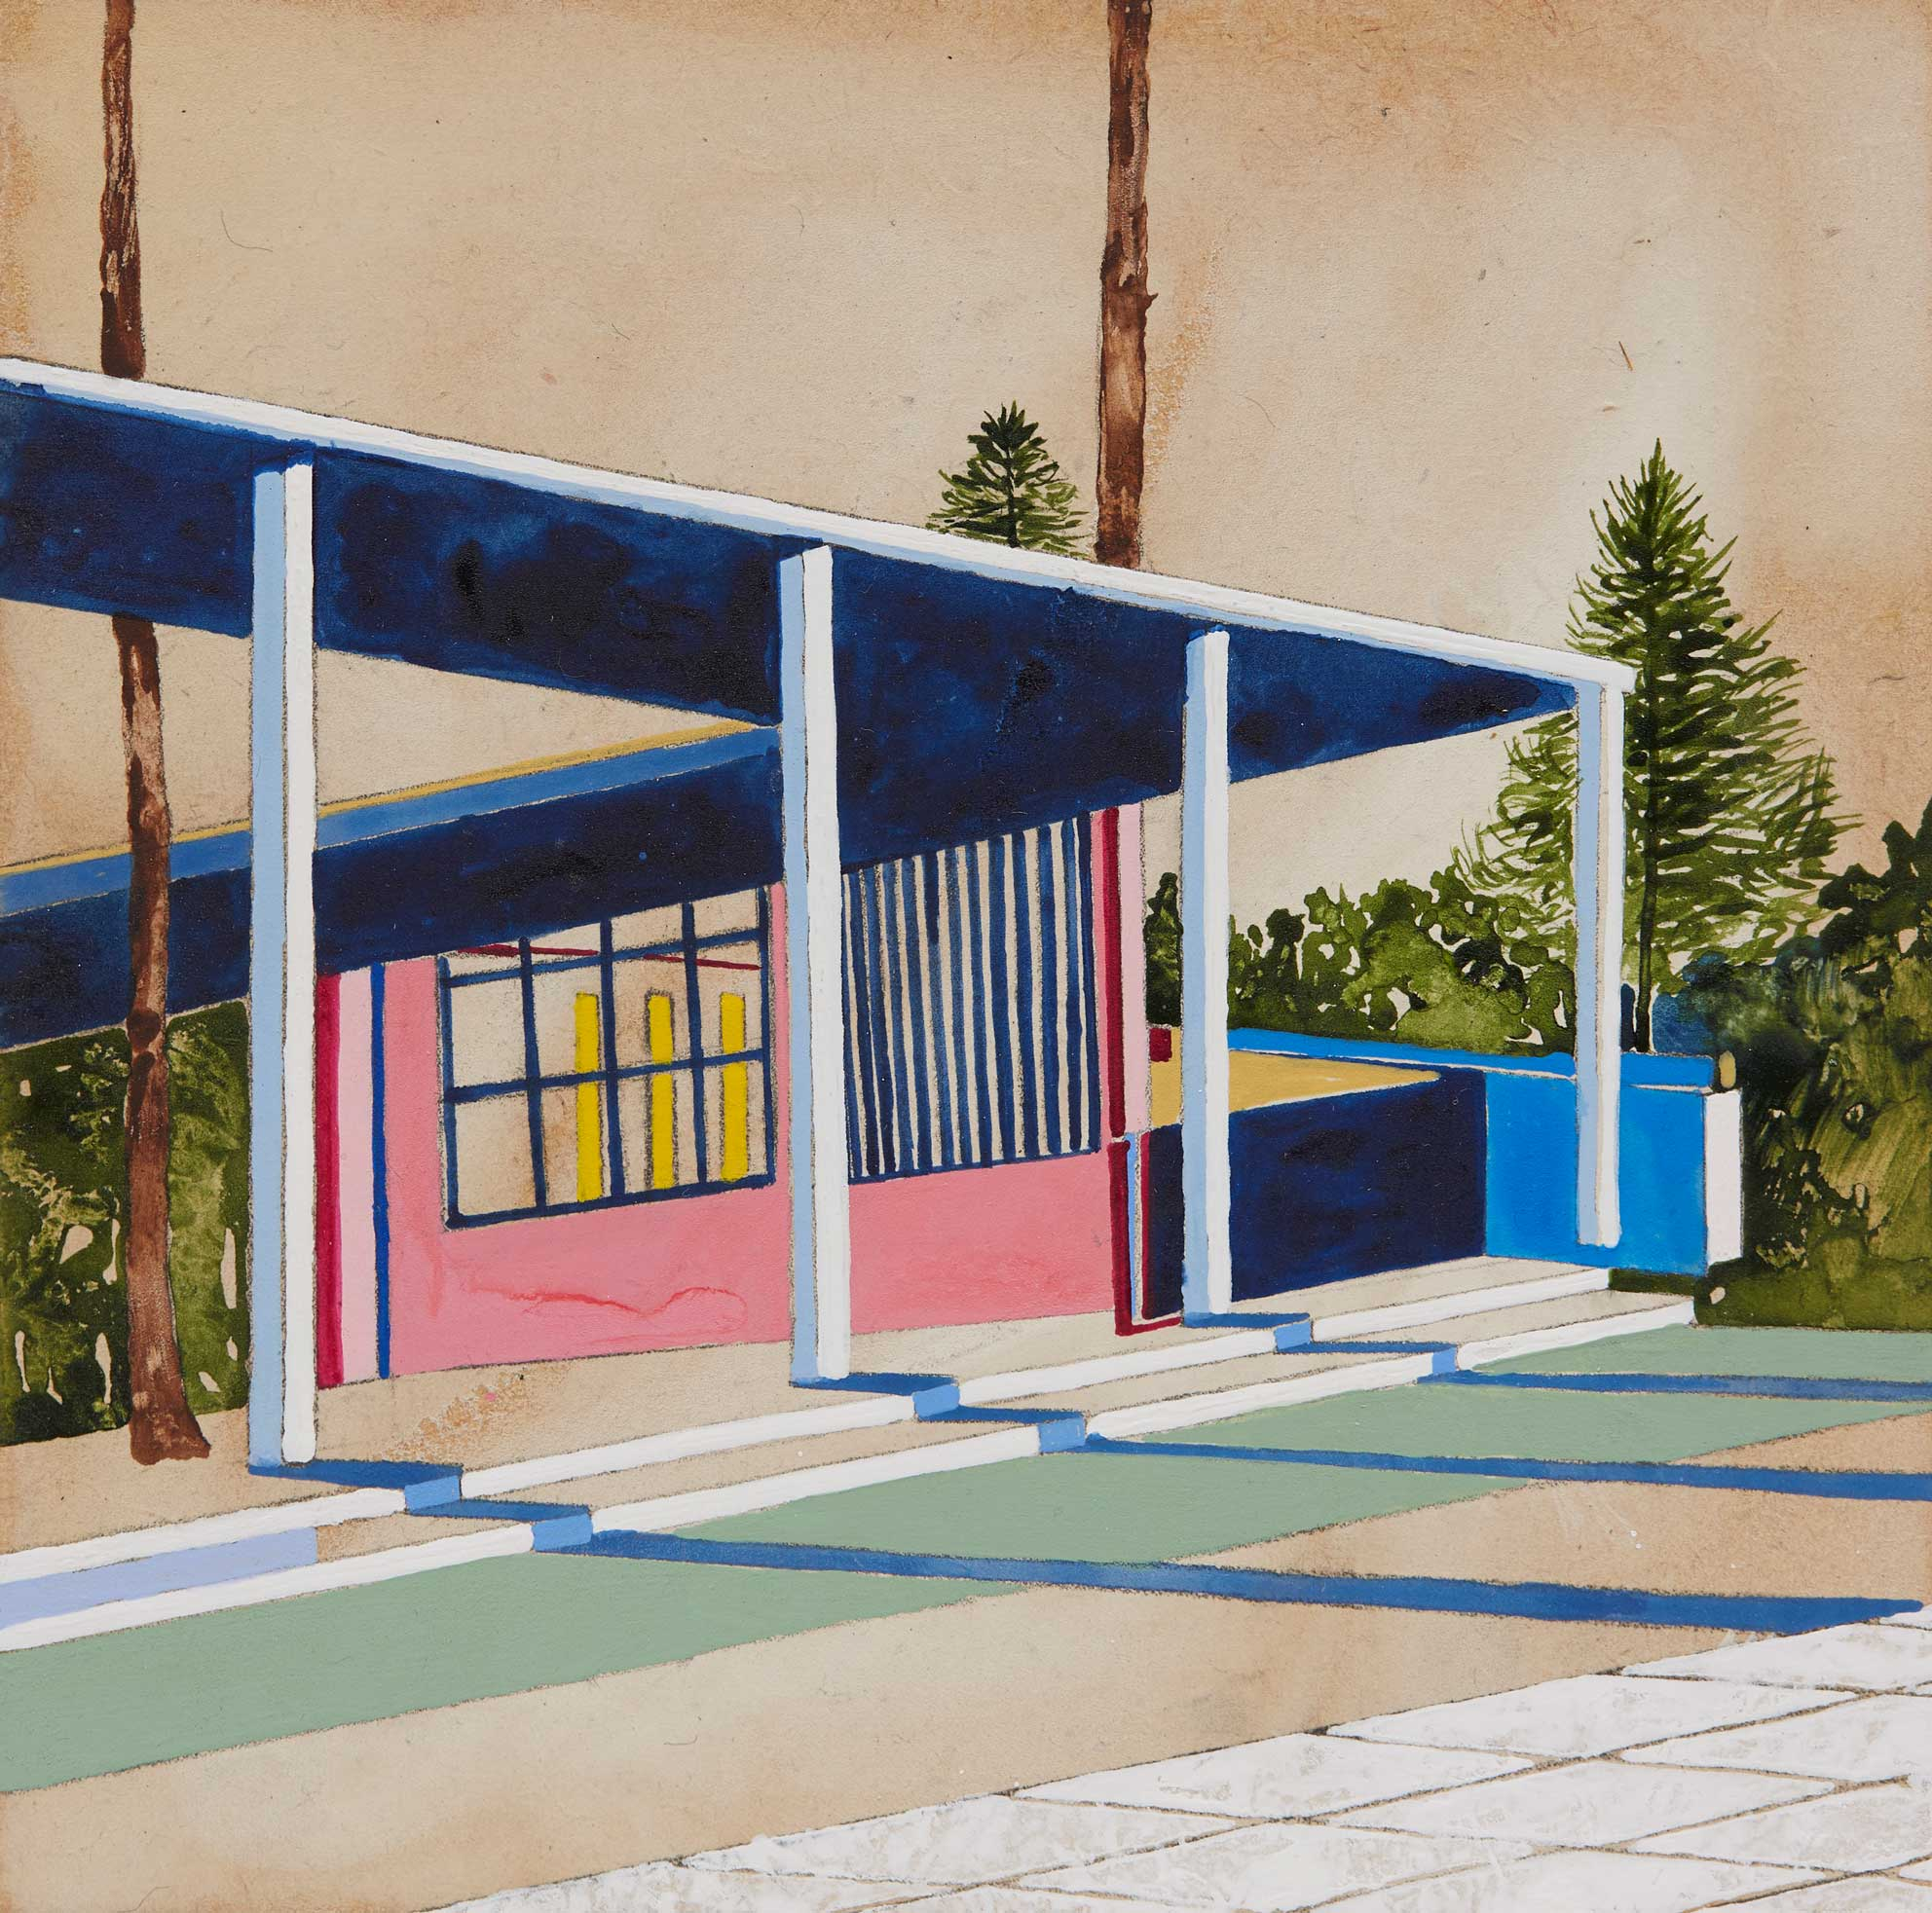 Afternoon Shadows, Charlotte Keates, Acrylic on panel, 34 x 34 cm